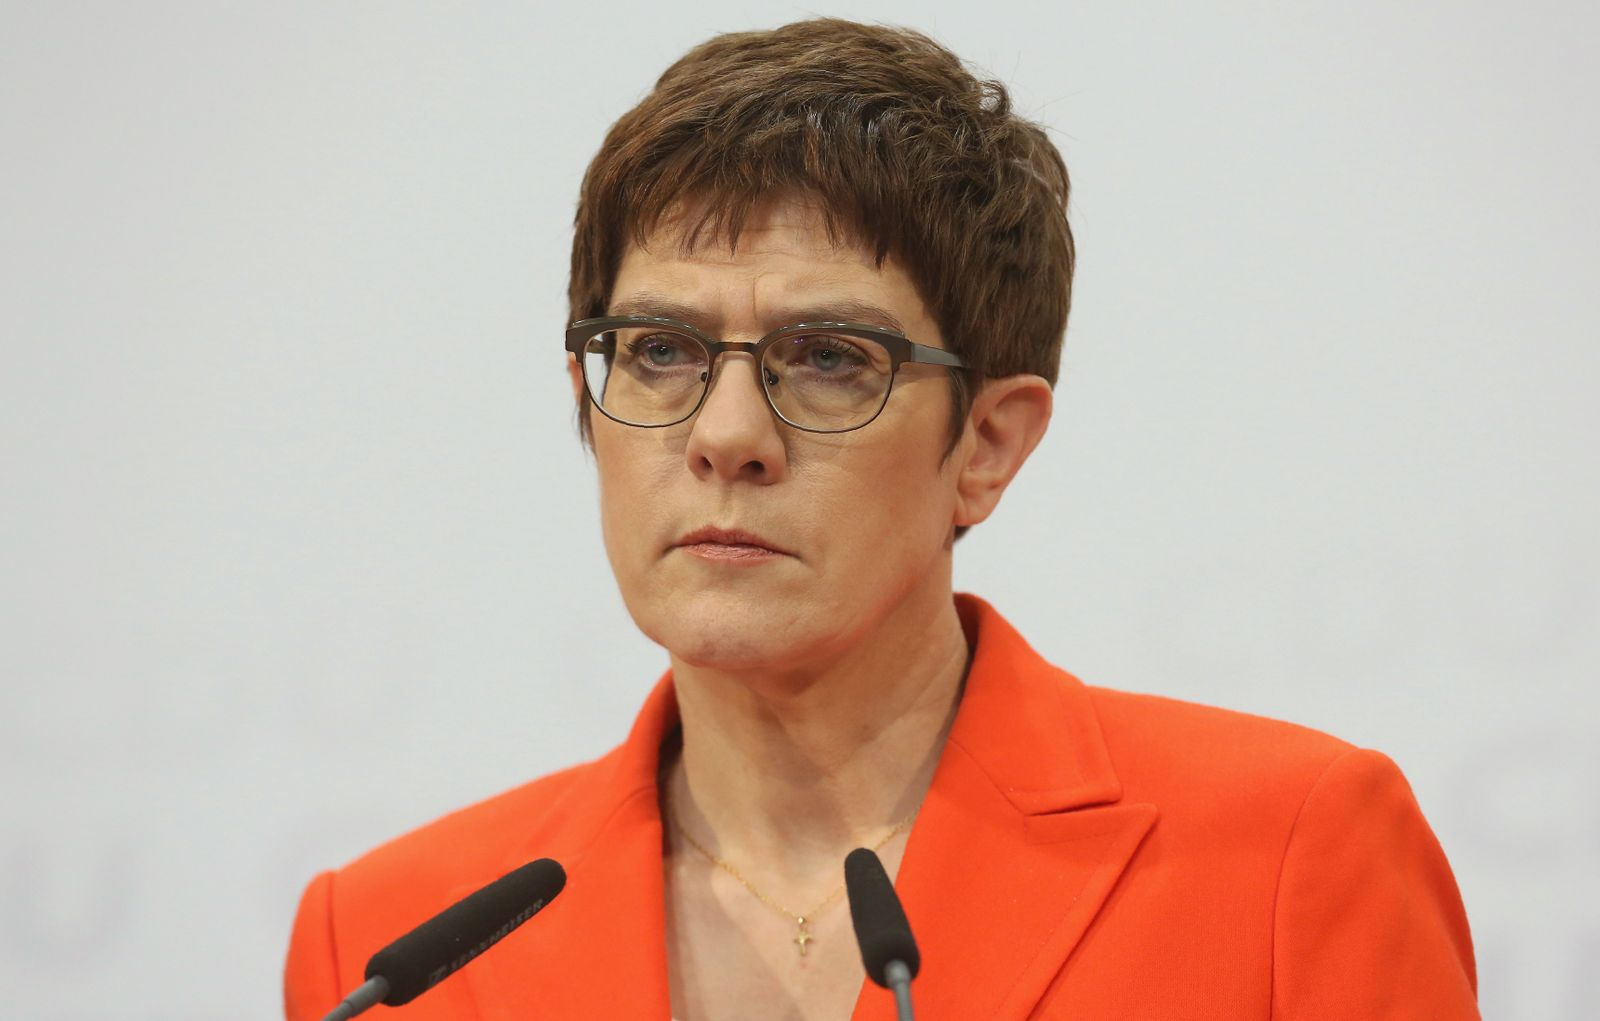 GERMANY-POLITICS-PARTIES-CDU-THURINGIA